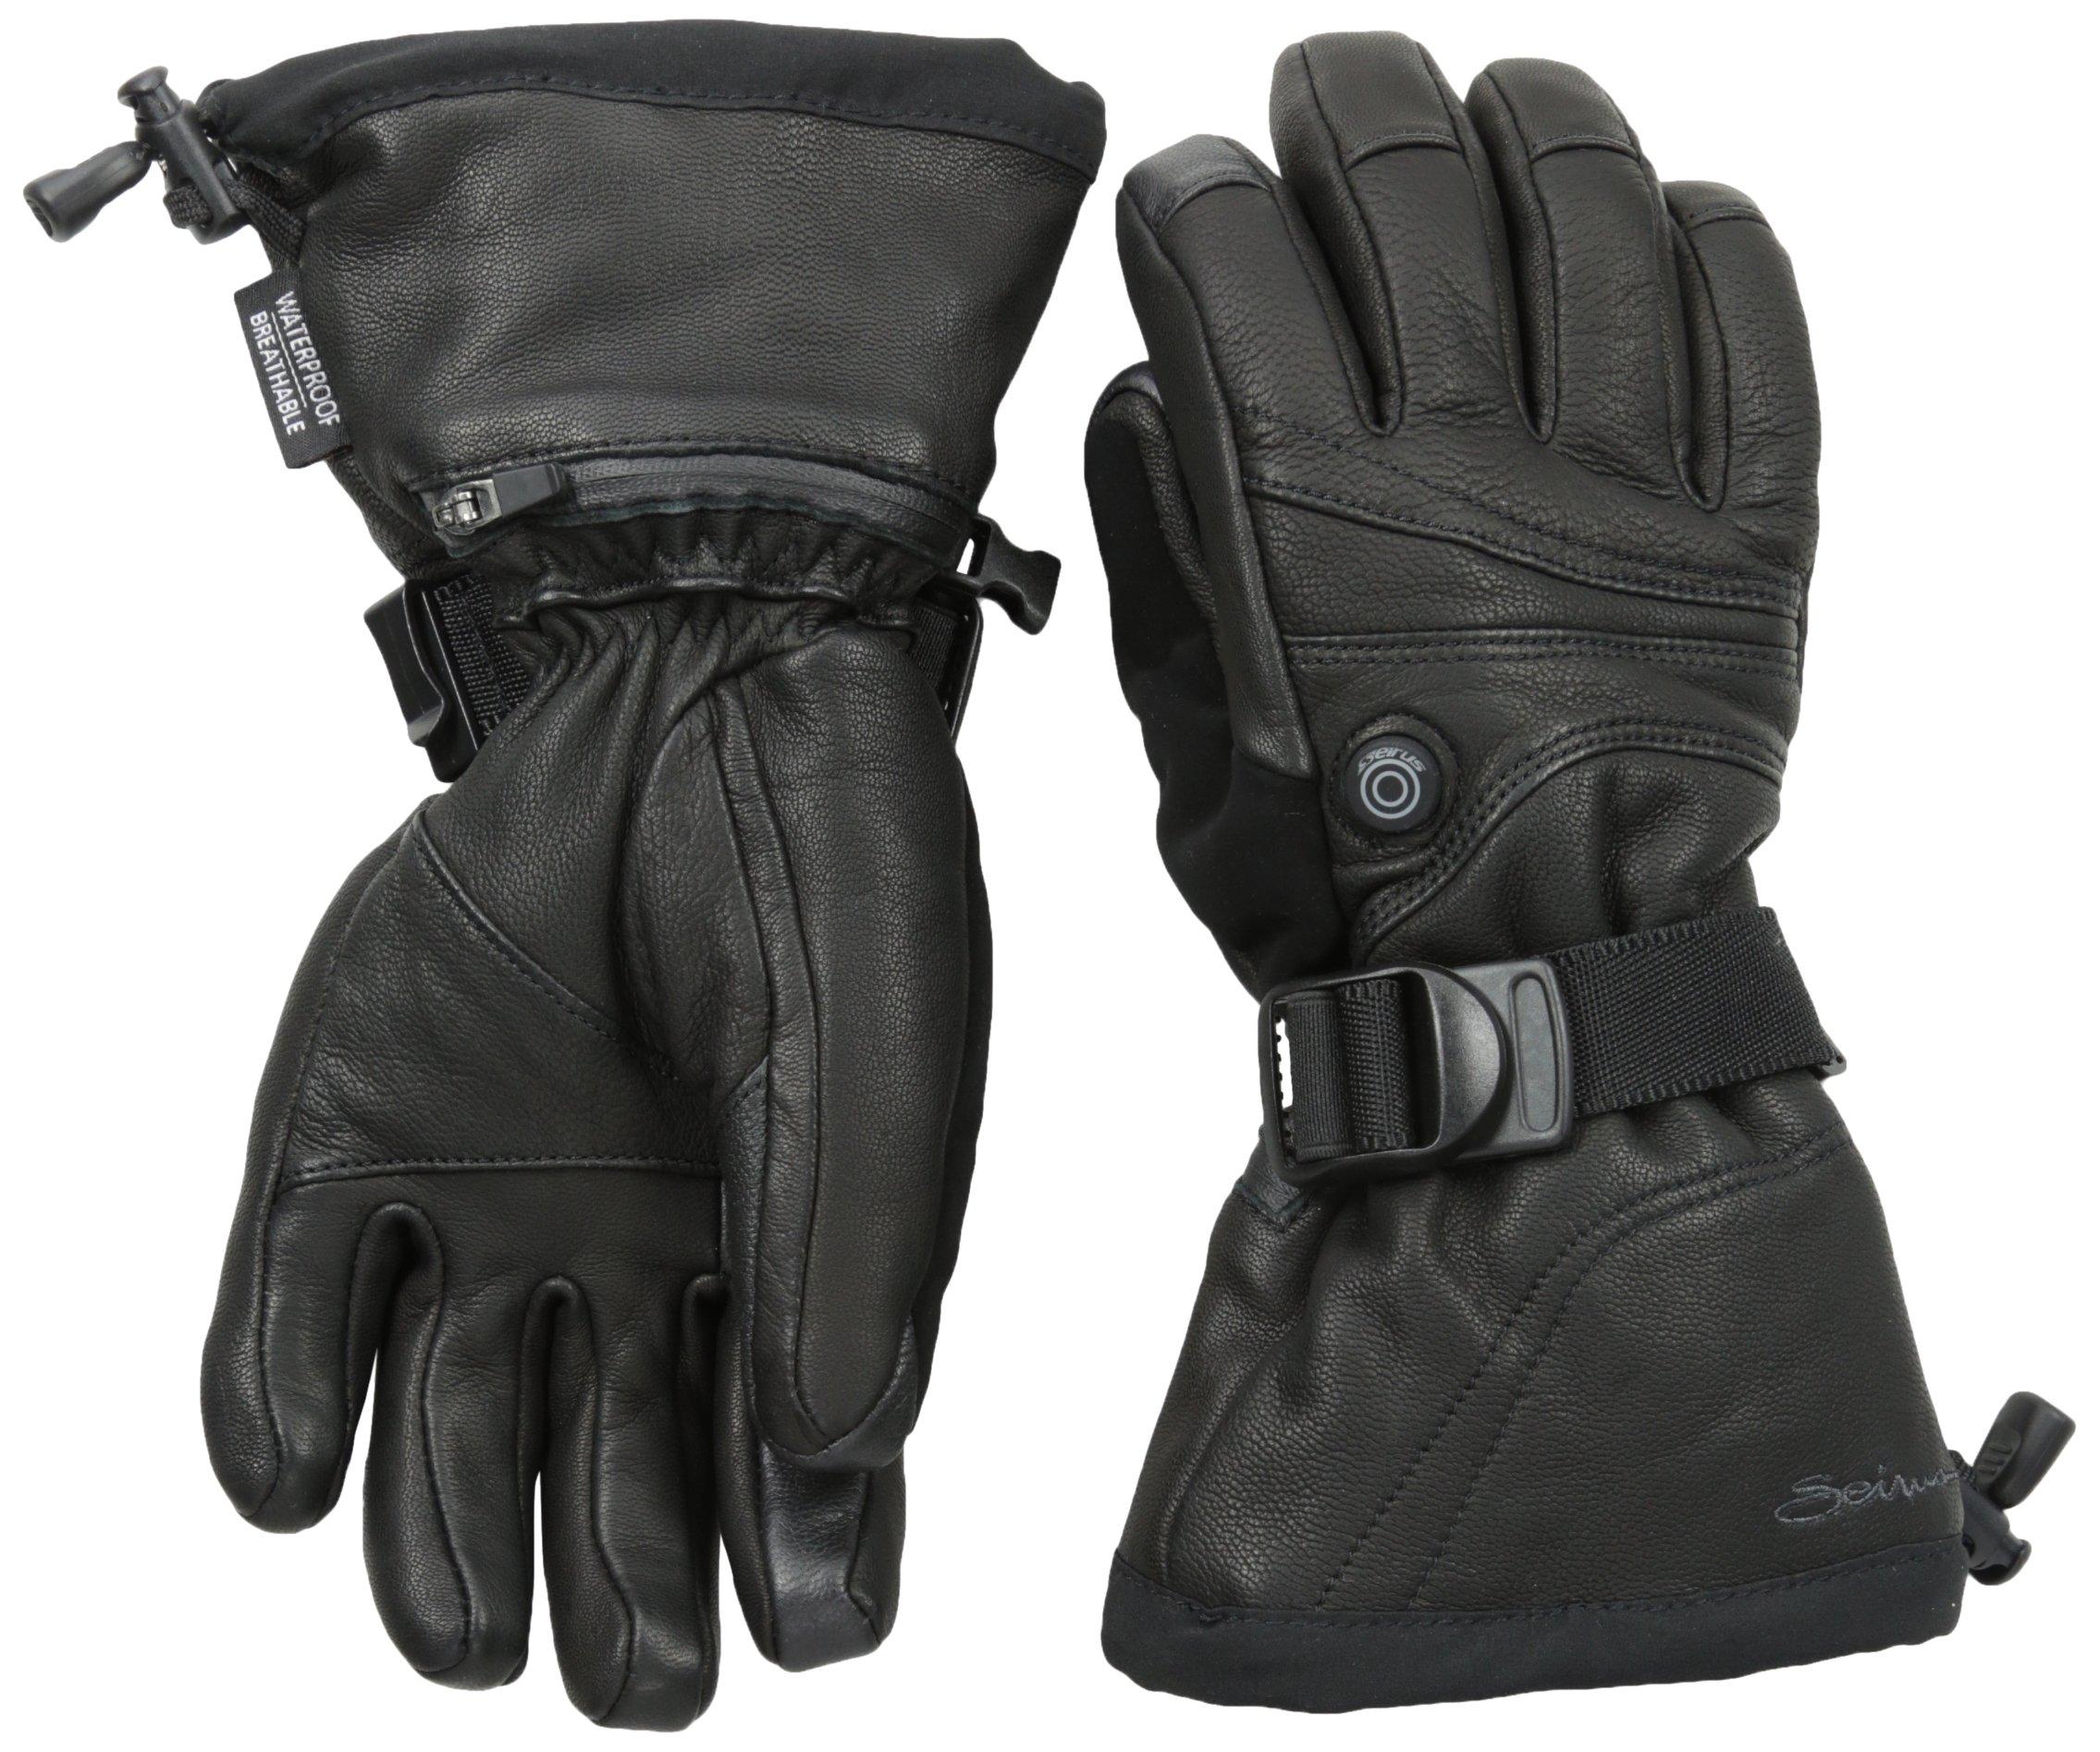 Seirus Innovation Women's Heat Touch Ignite Gloves, Medium, Black by Seirus Innovation (Image #1)